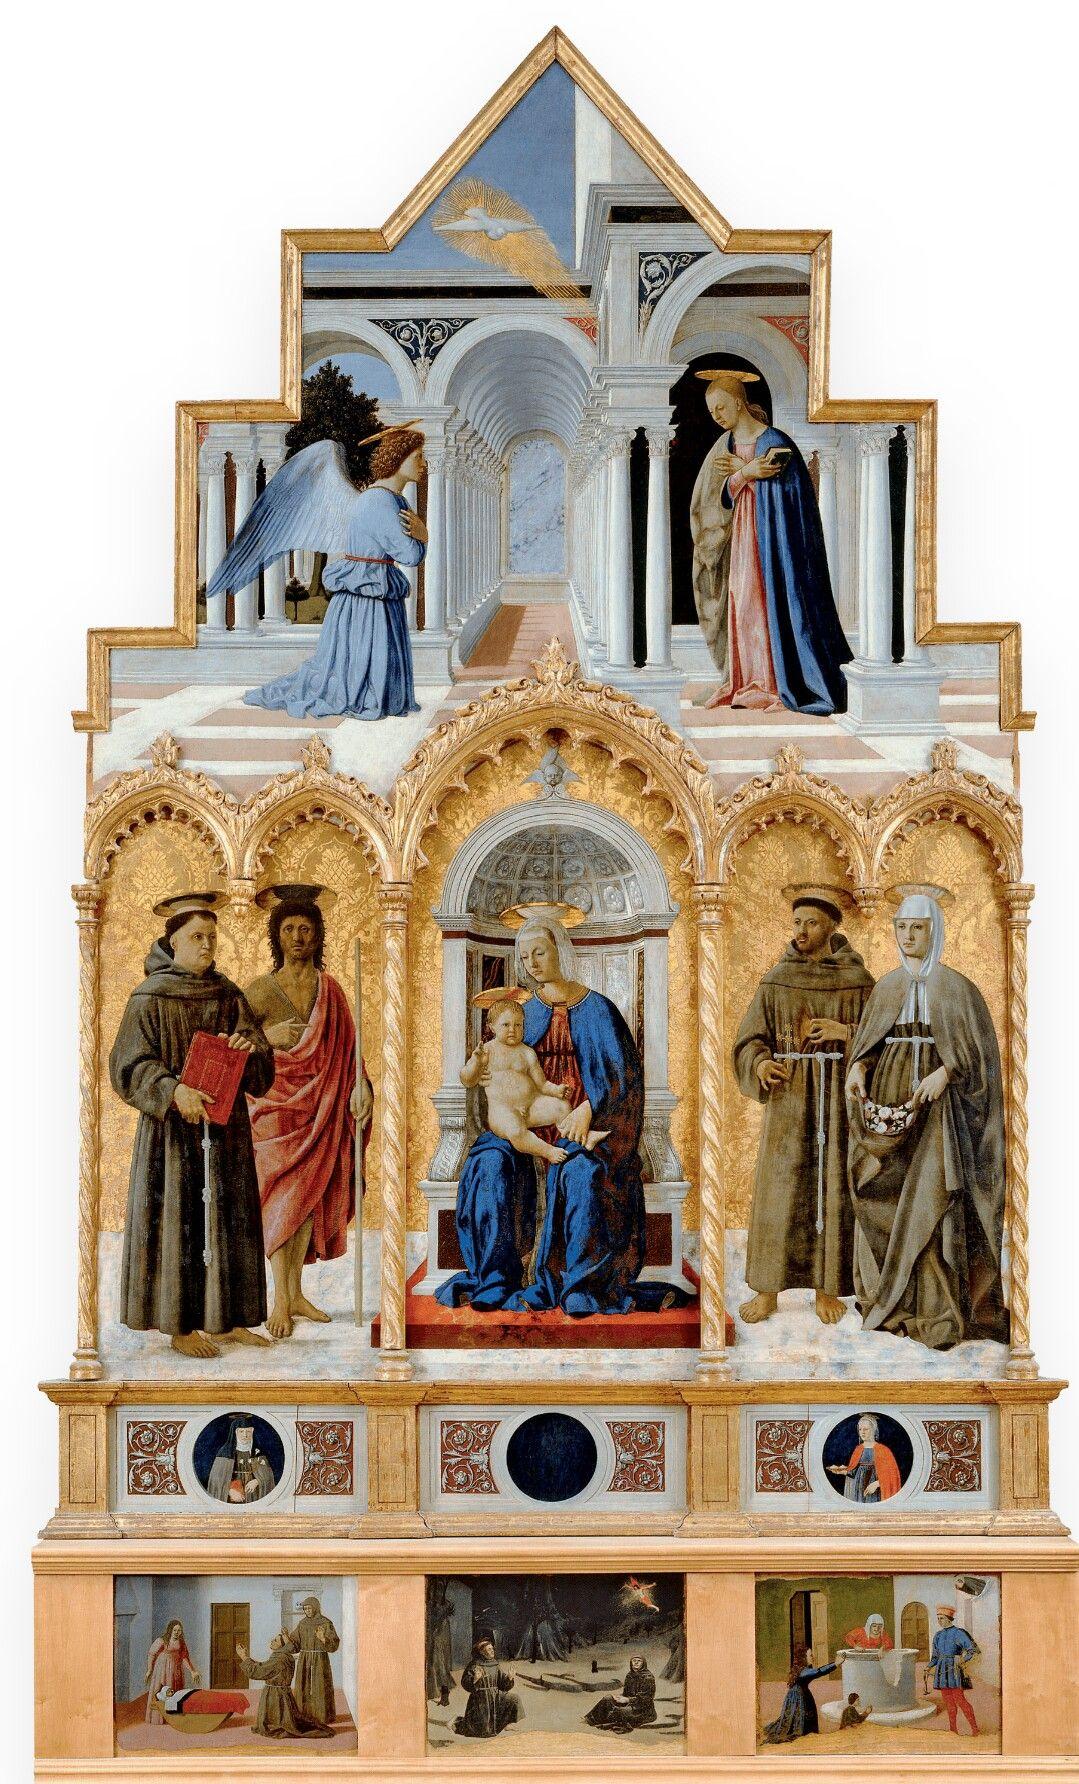 Polittico di Perugia. 1460-1470 338x238. Galleria ...